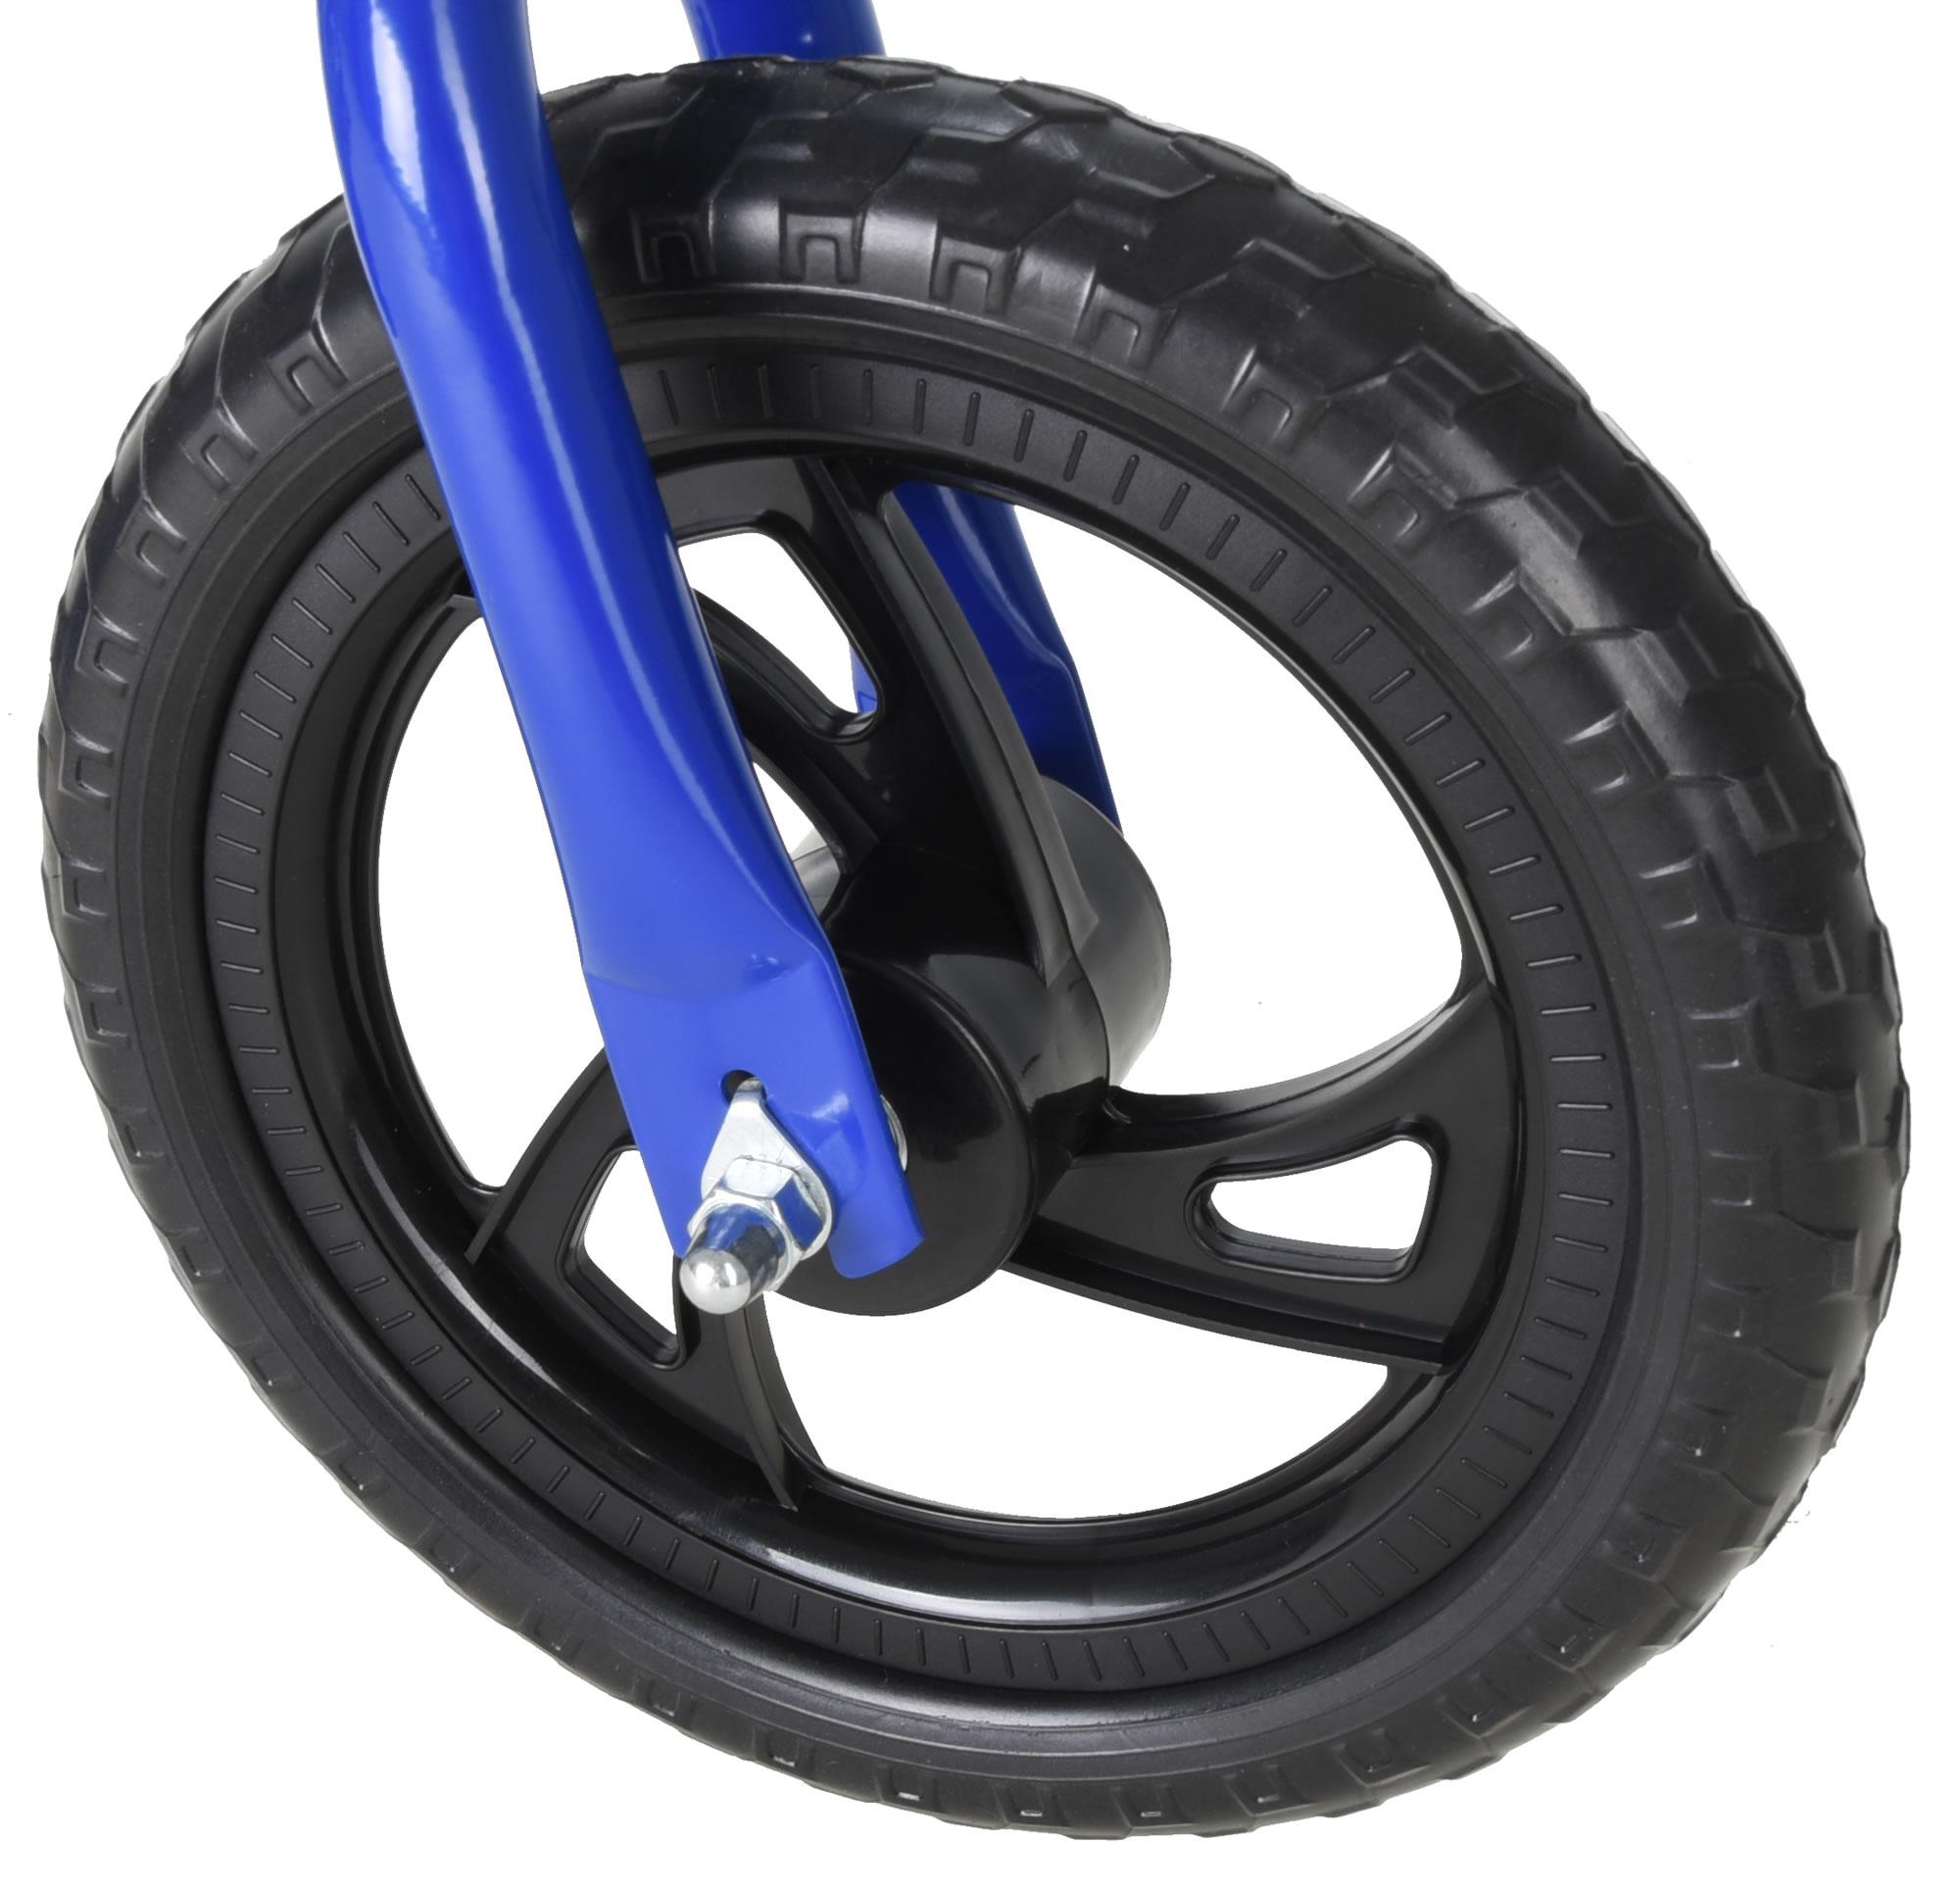 Vilano-Rally-Childrens-Balance-Bike-No-Pedal-Toddler-Push-Bicycle thumbnail 12